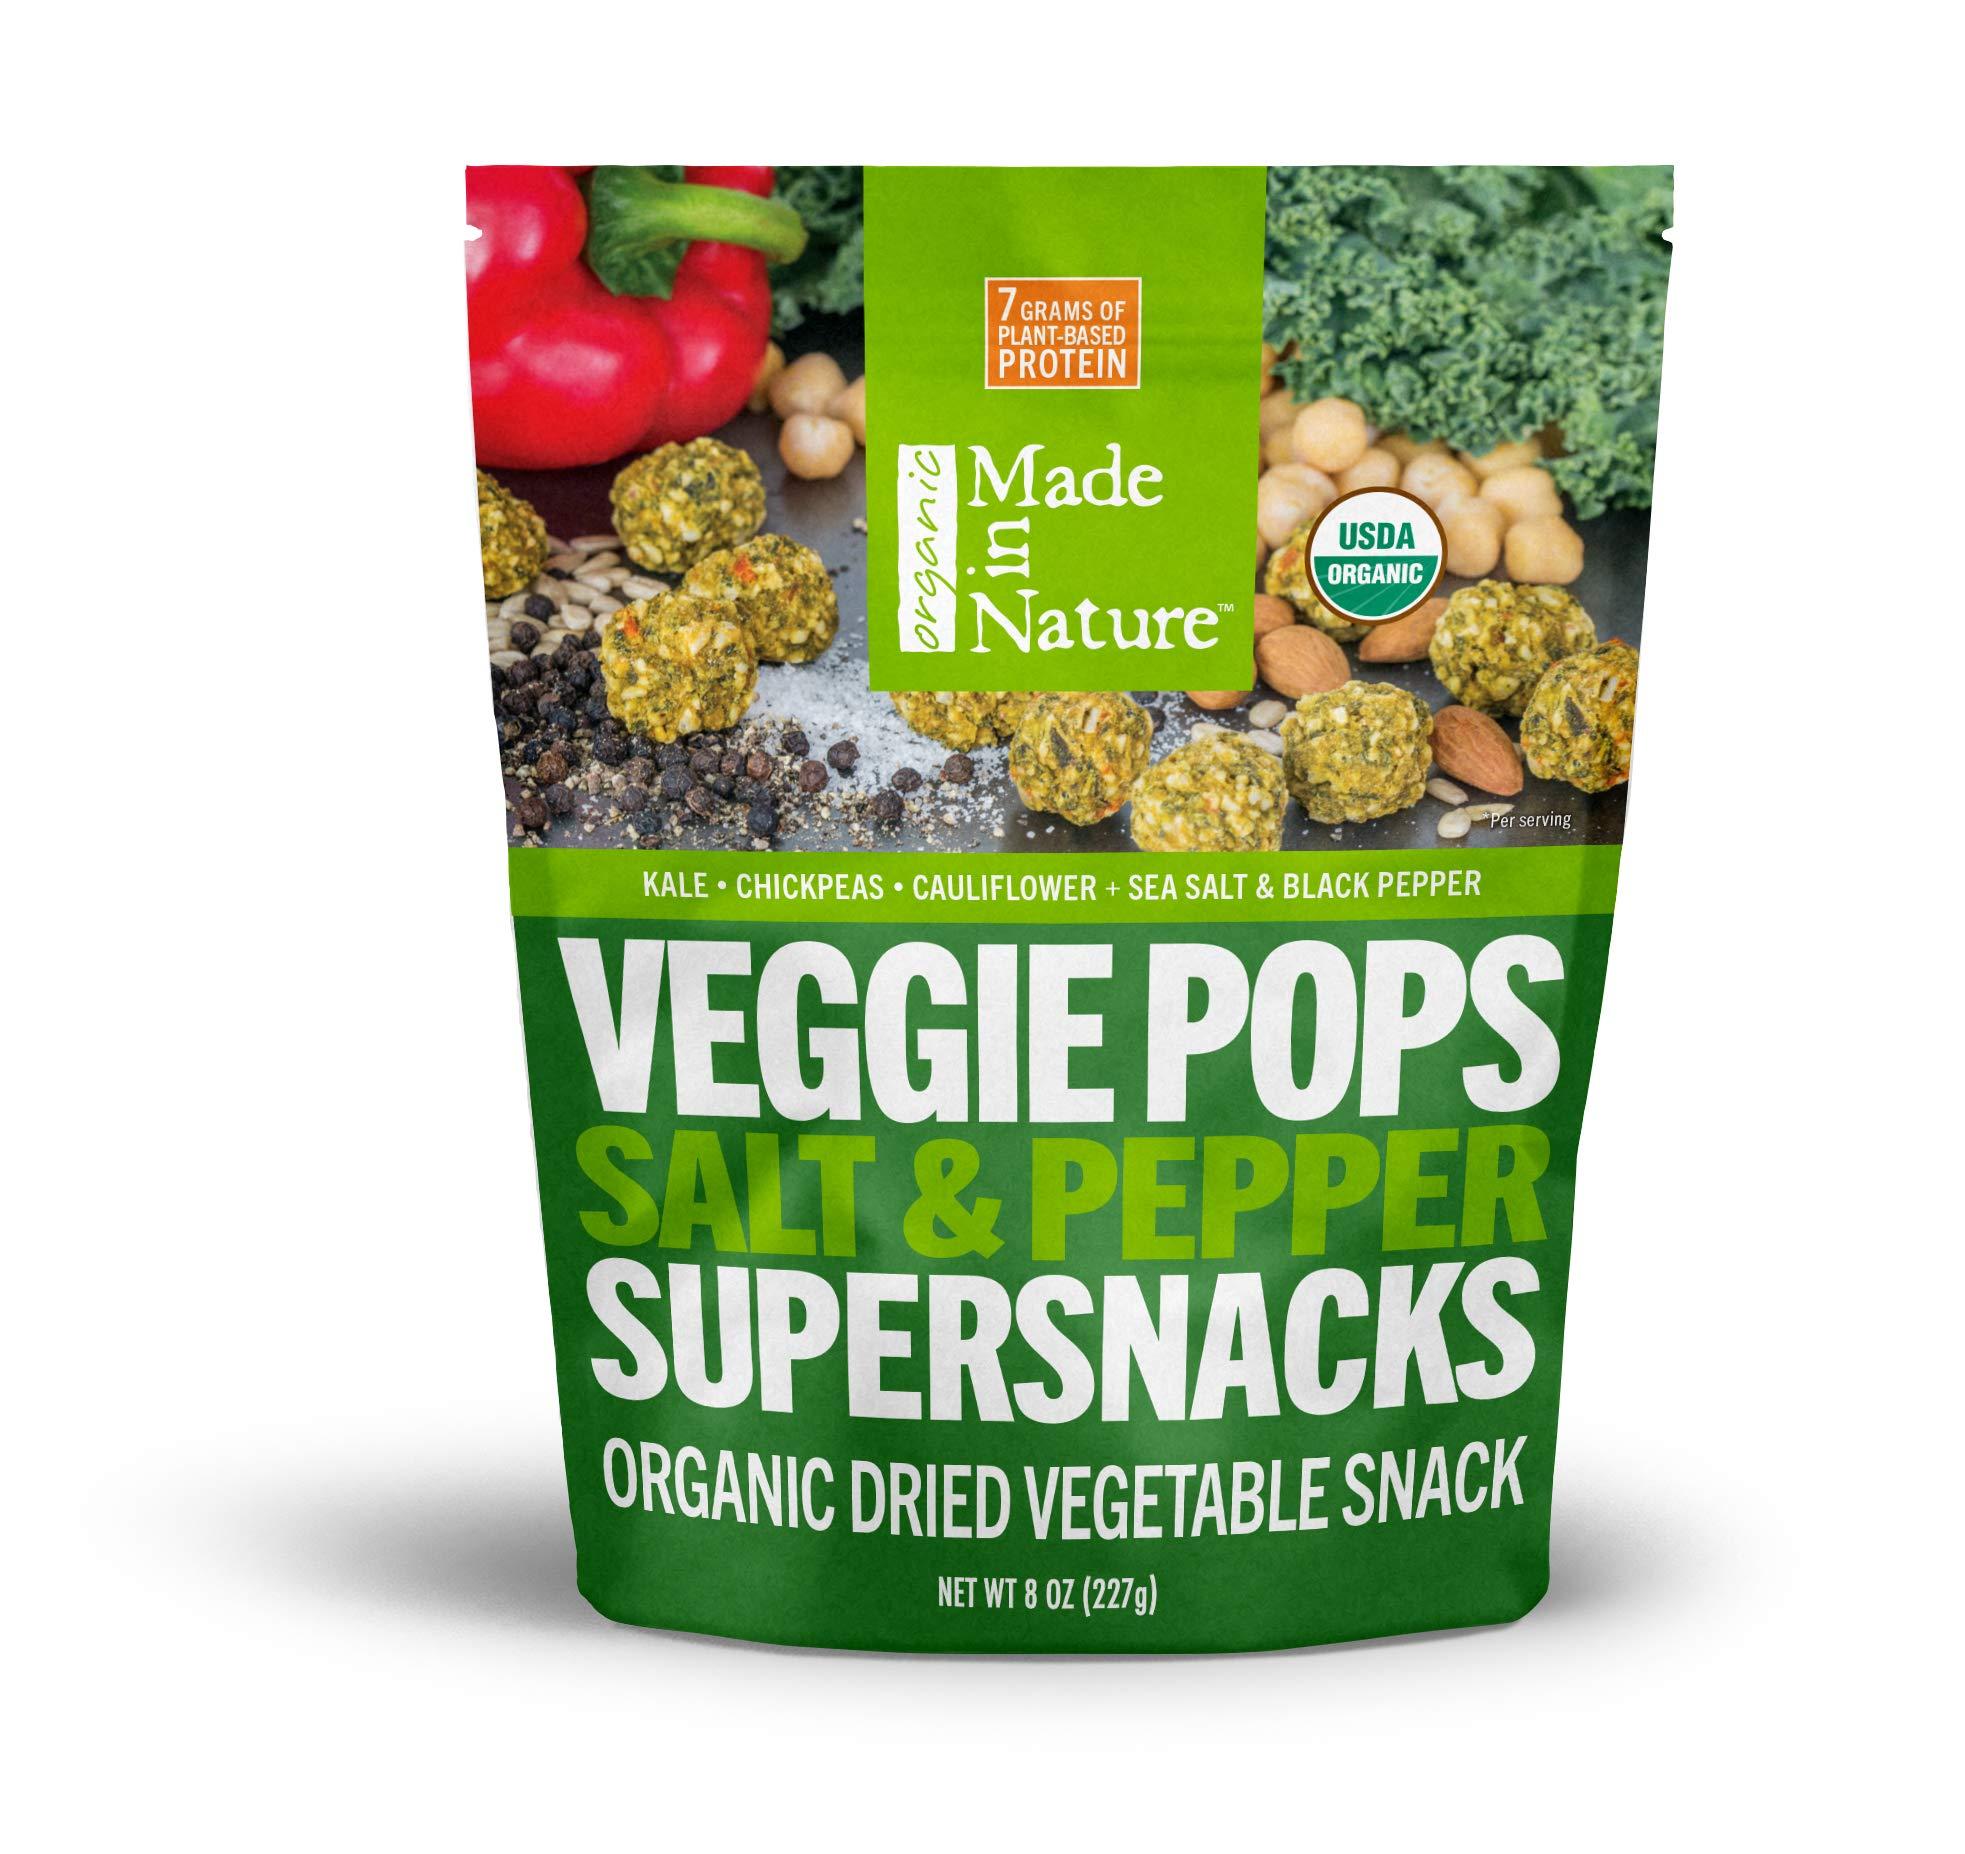 made in nature veggie pops